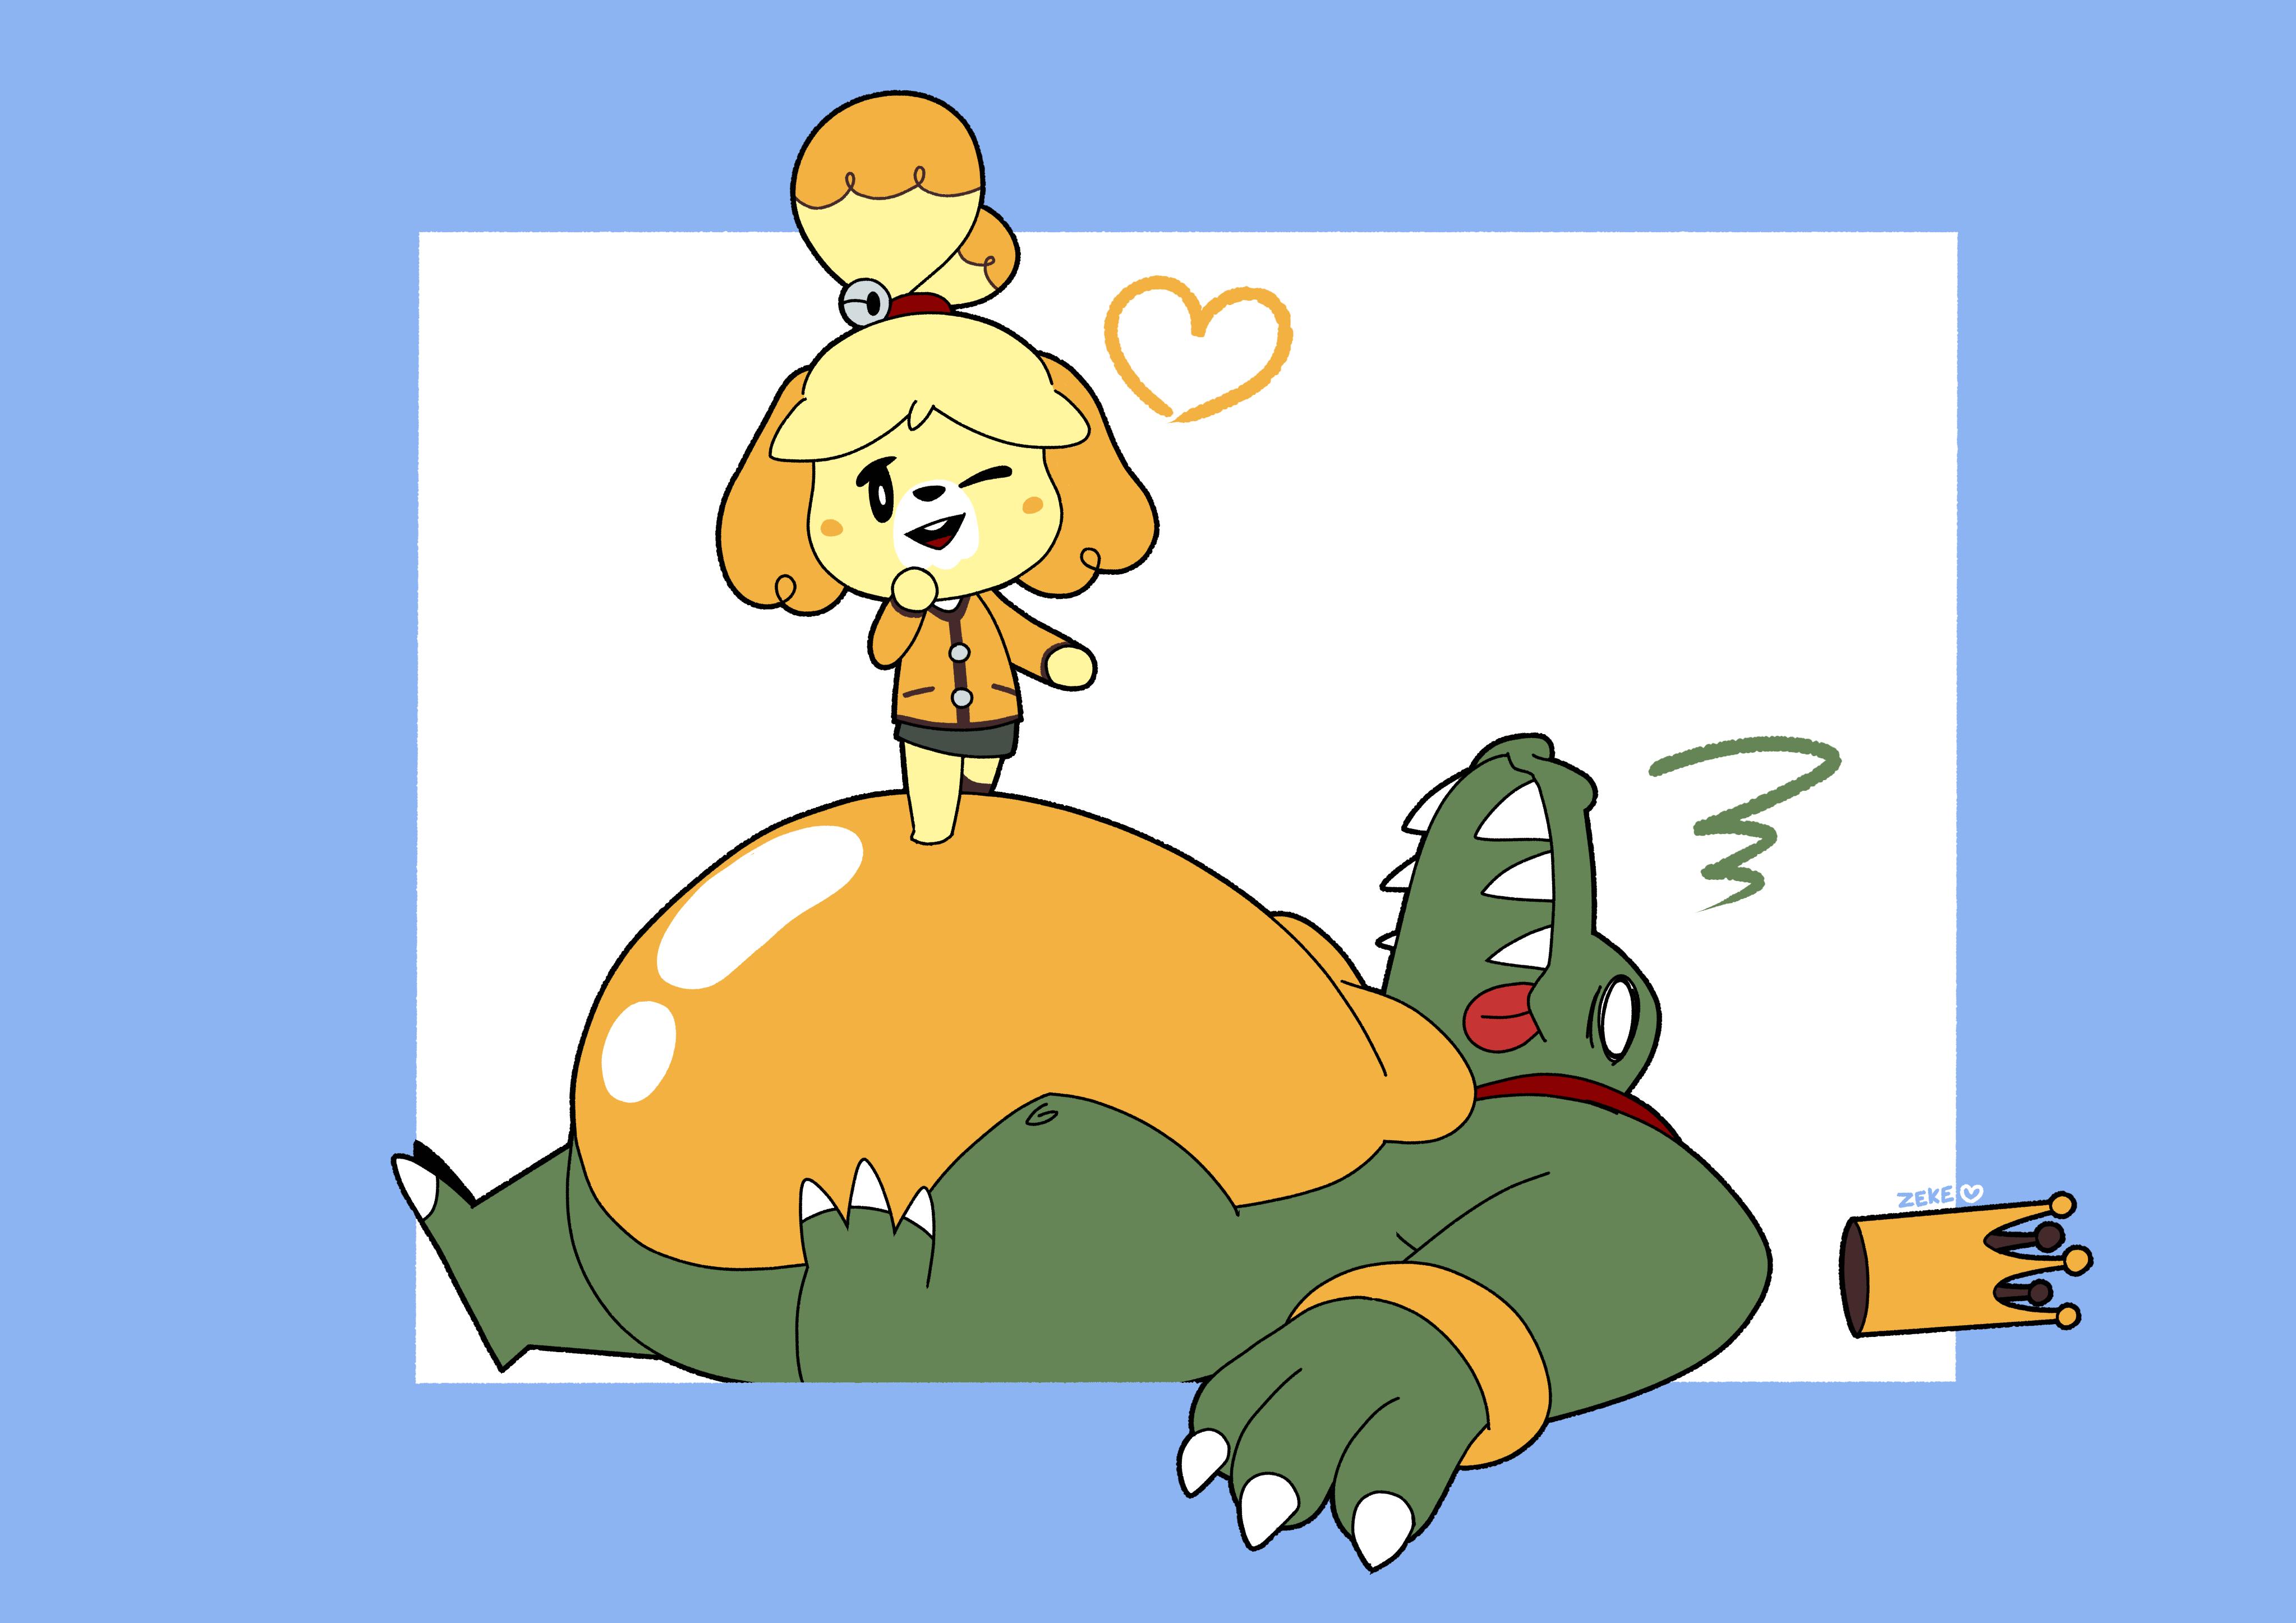 Isabelle In Smash!